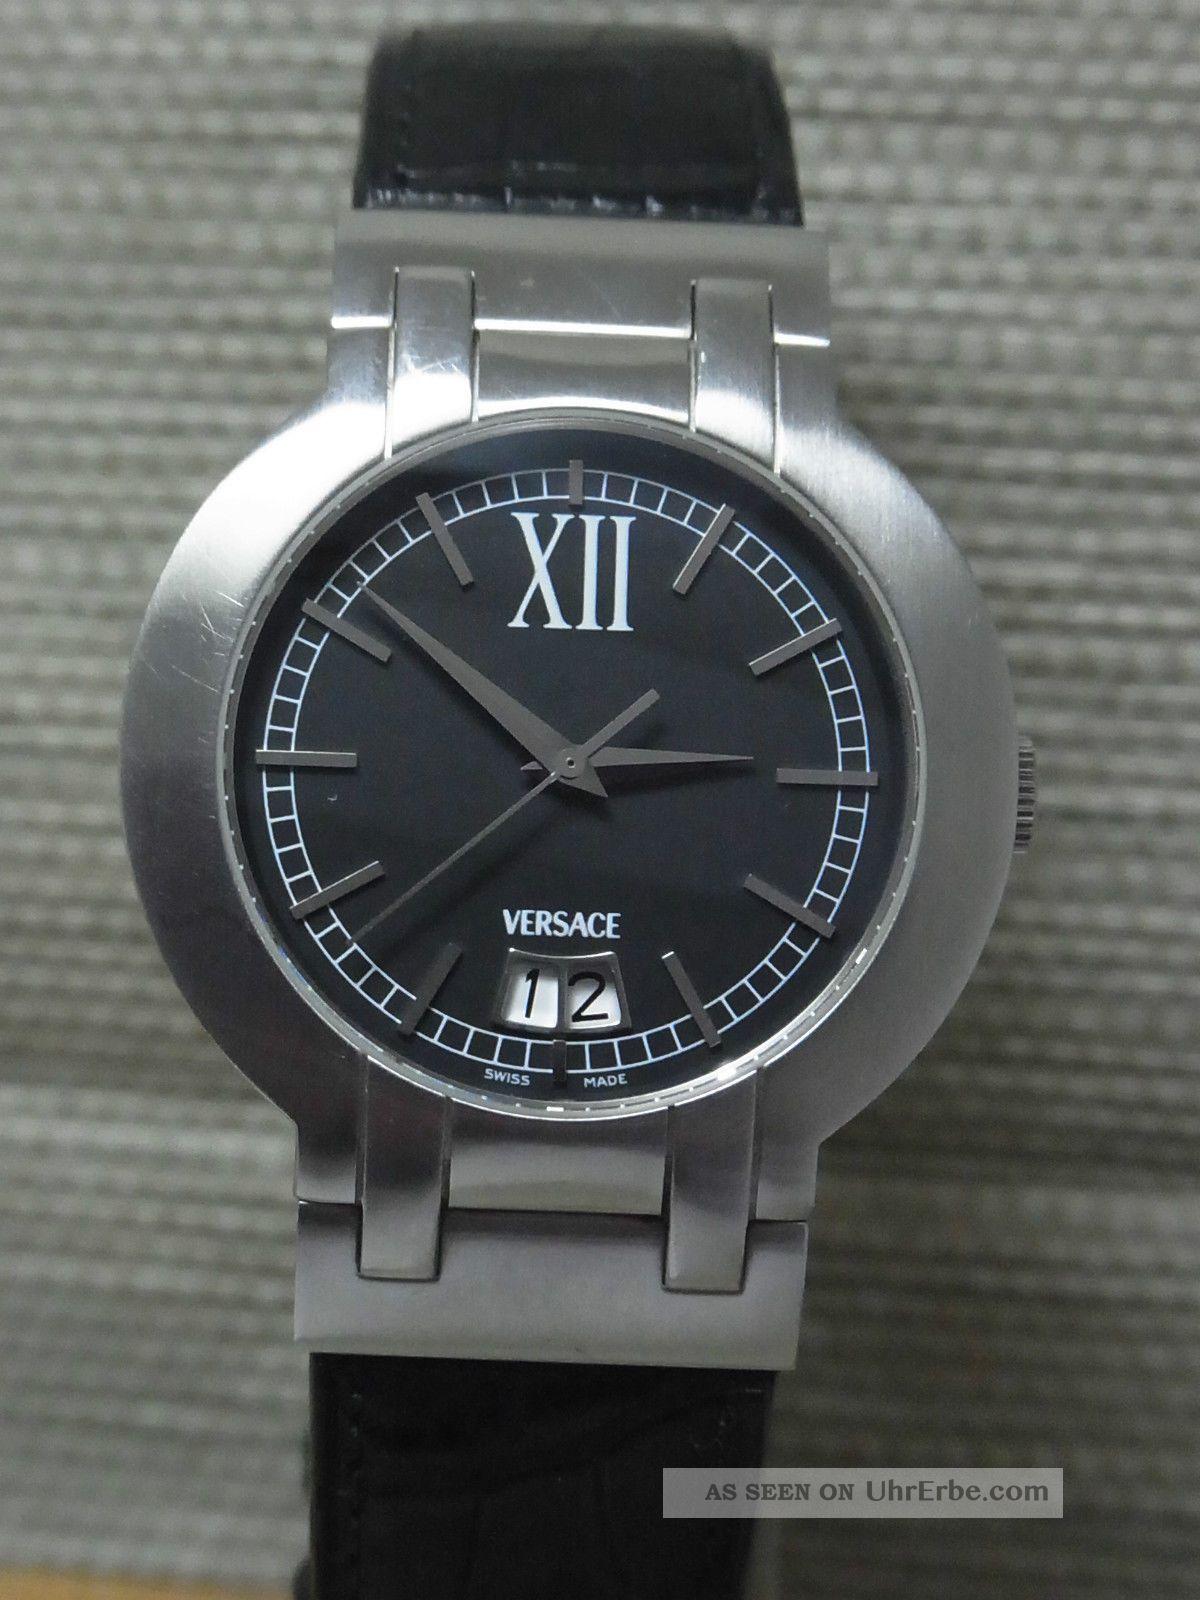 Versace Madison Big Date Automatik - Uhr (eta) - 42mm - Unisex Armbanduhren Bild